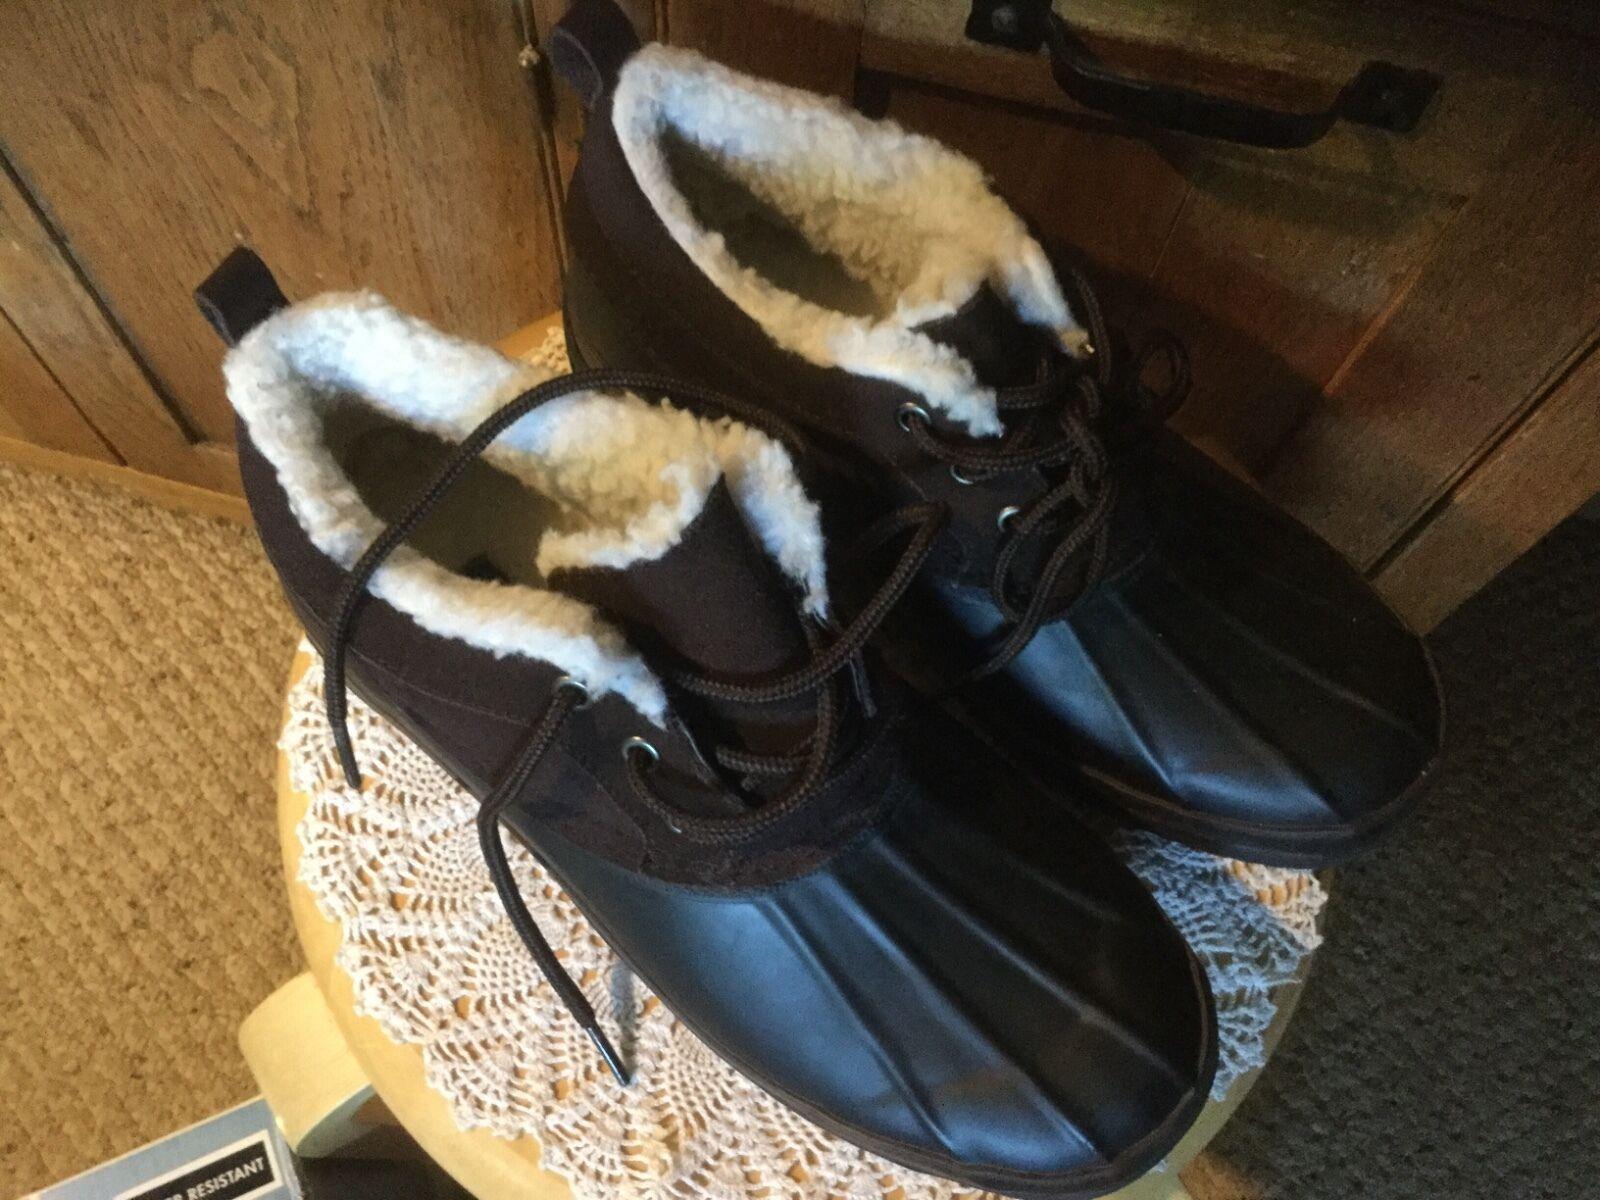 NIB Water Bass Hail 1 Winter Water NIB Resistant Stiefel.  Dark Braun.  Damenschuhe Größe 11. c1964d